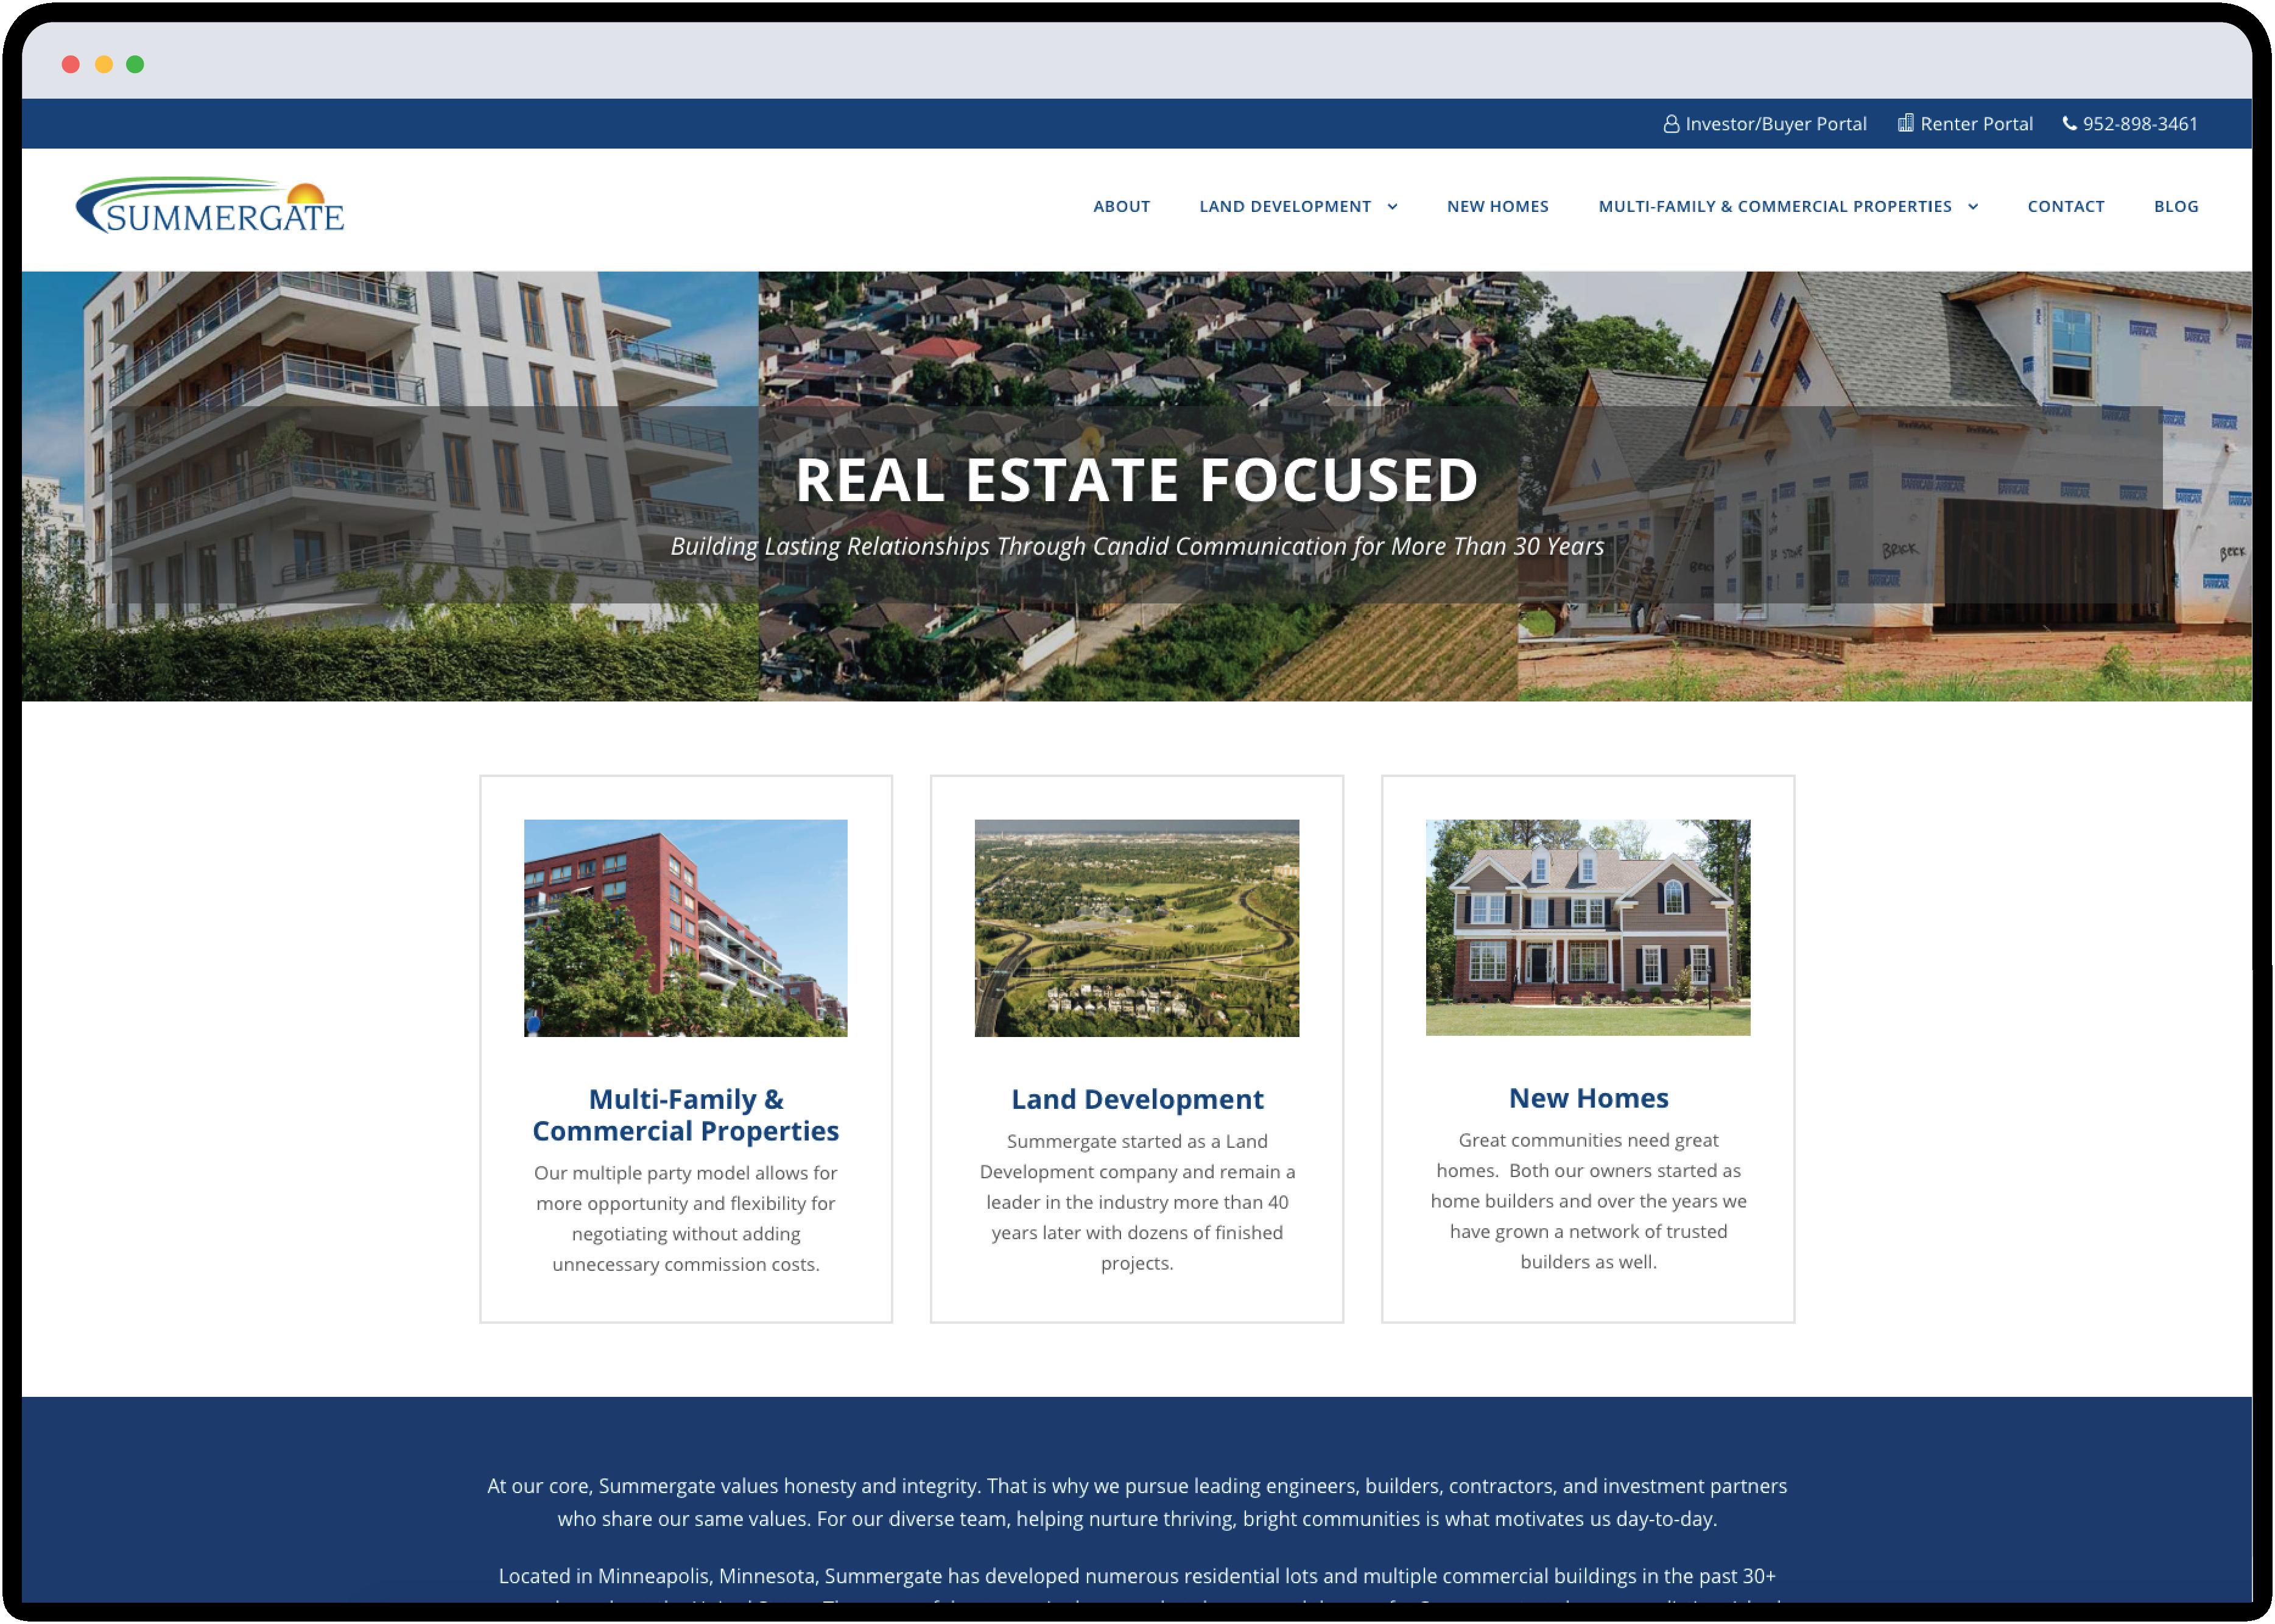 Summergate website